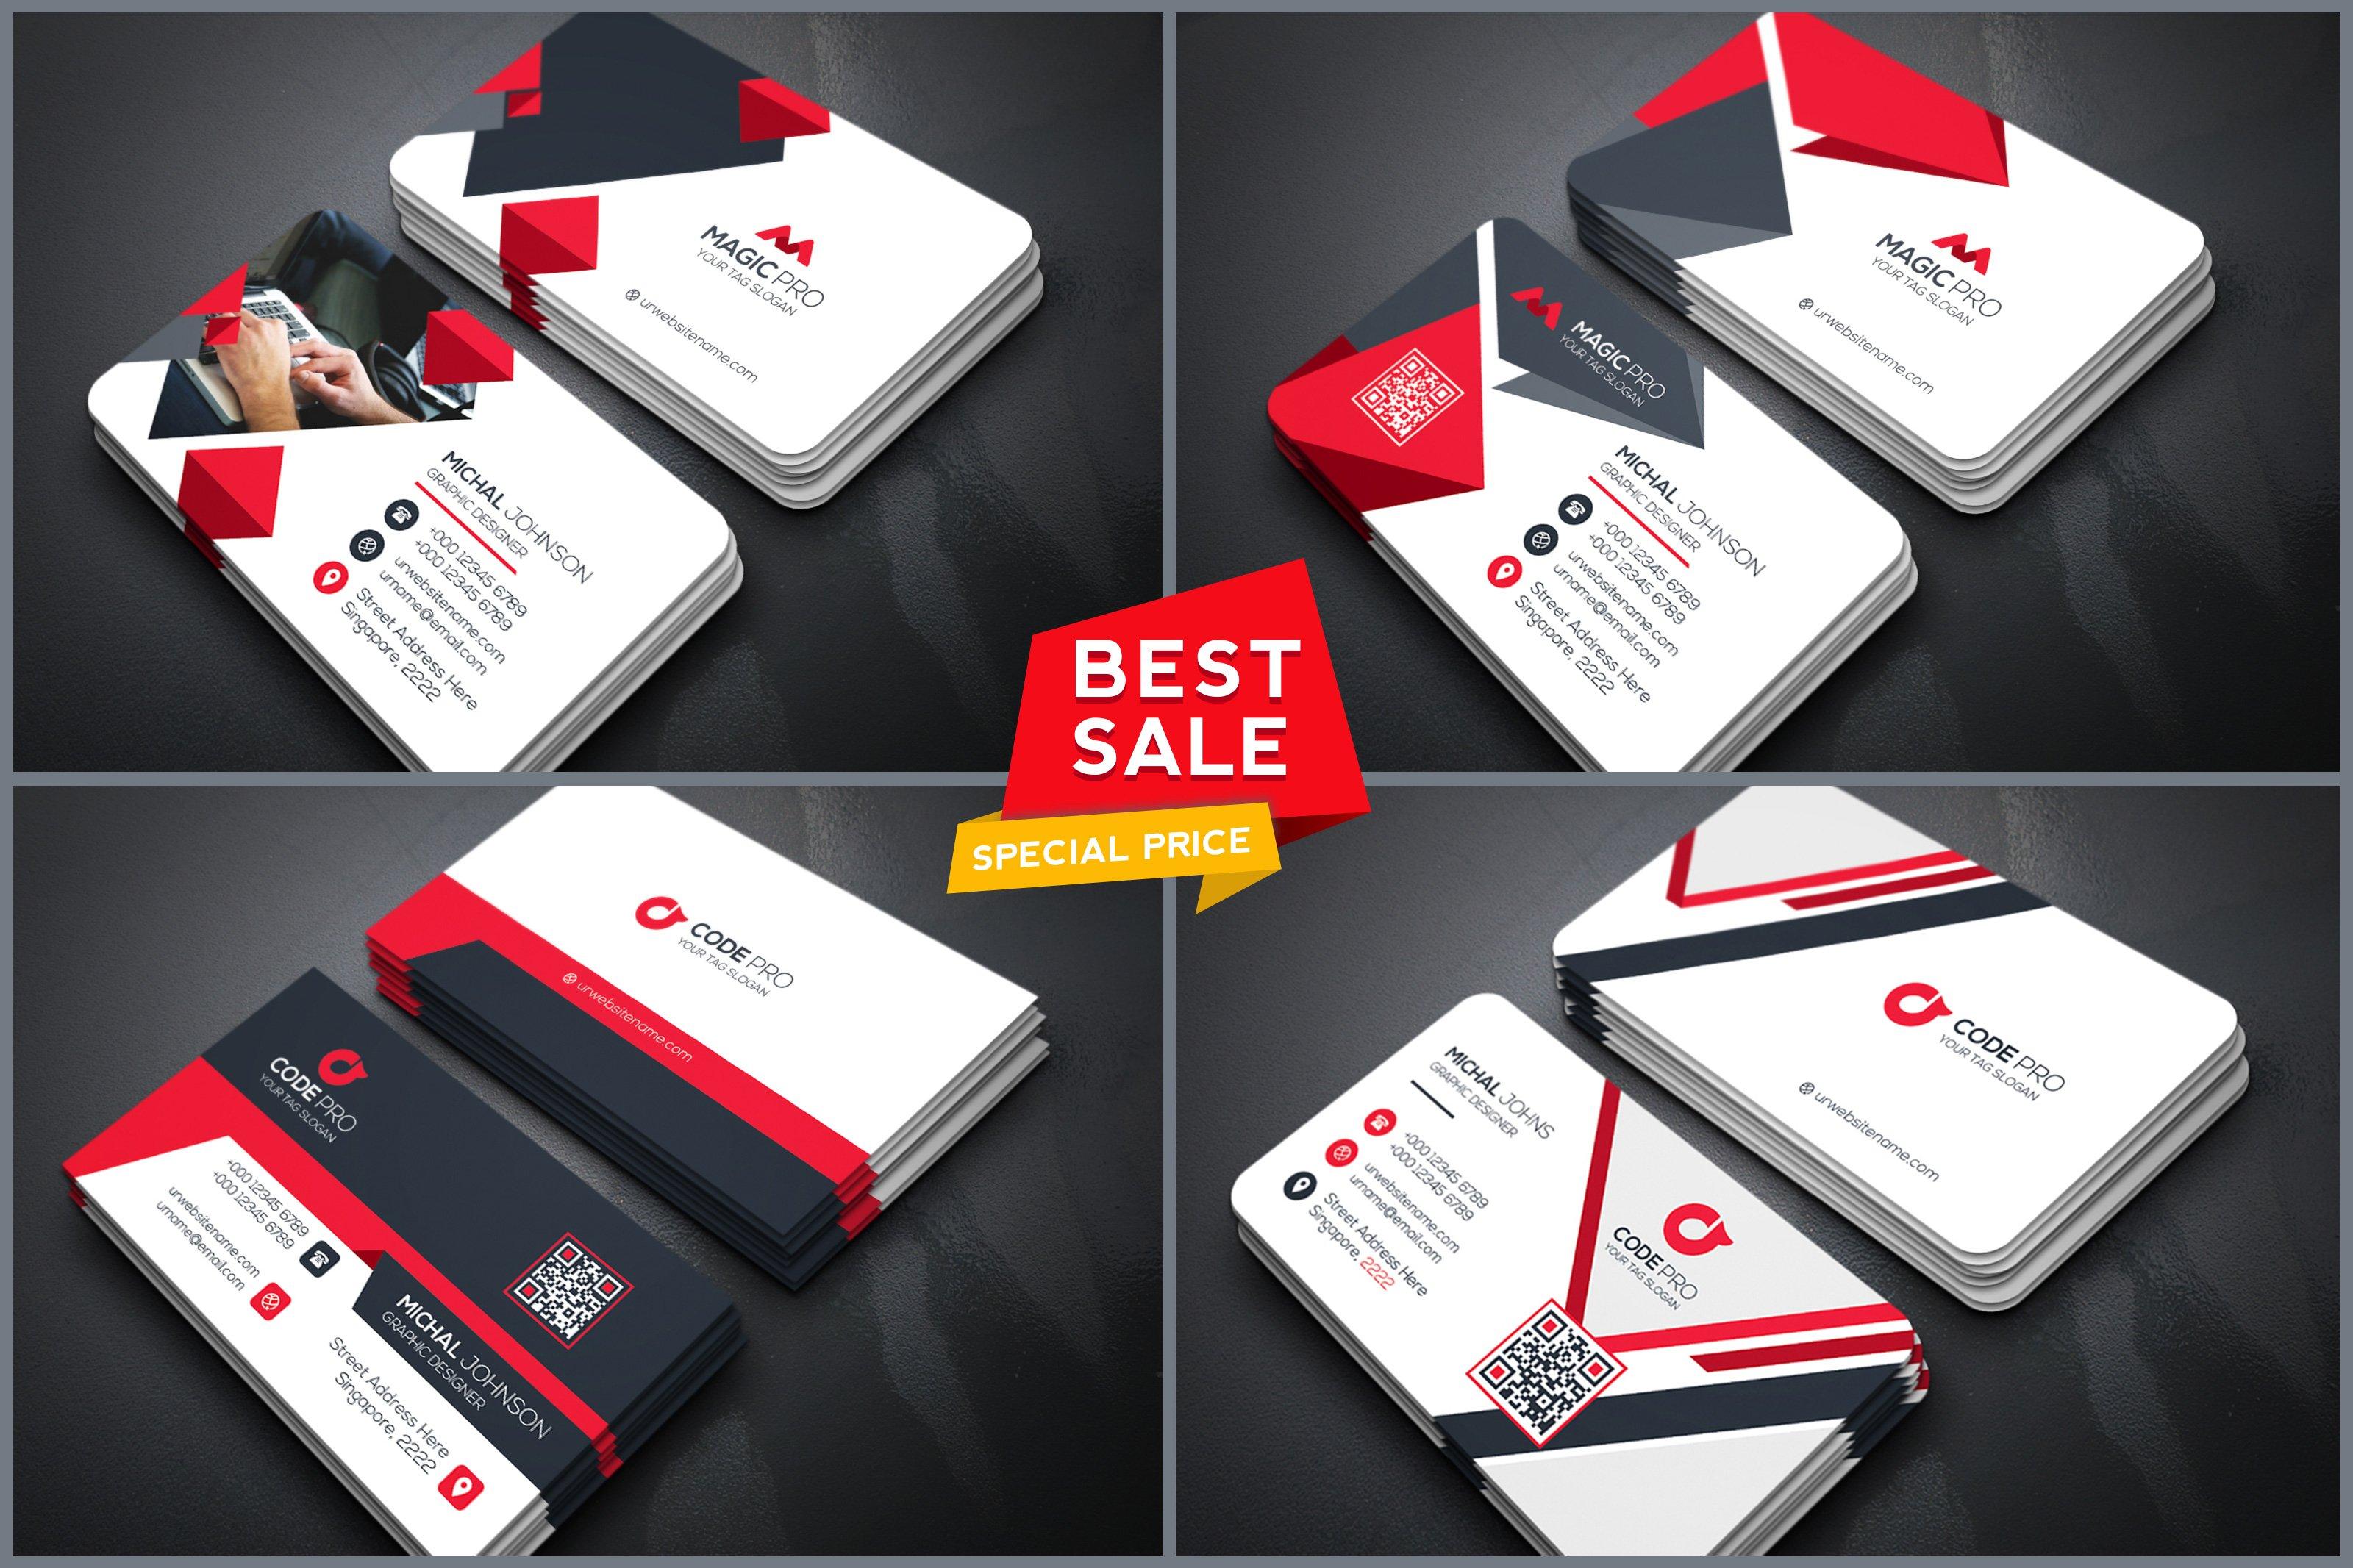 Usmc business cards choice image free business cards tag business cards images free business cards 150 business cards bundle graphic 150 business cards bundle magicingreecefo Image collections